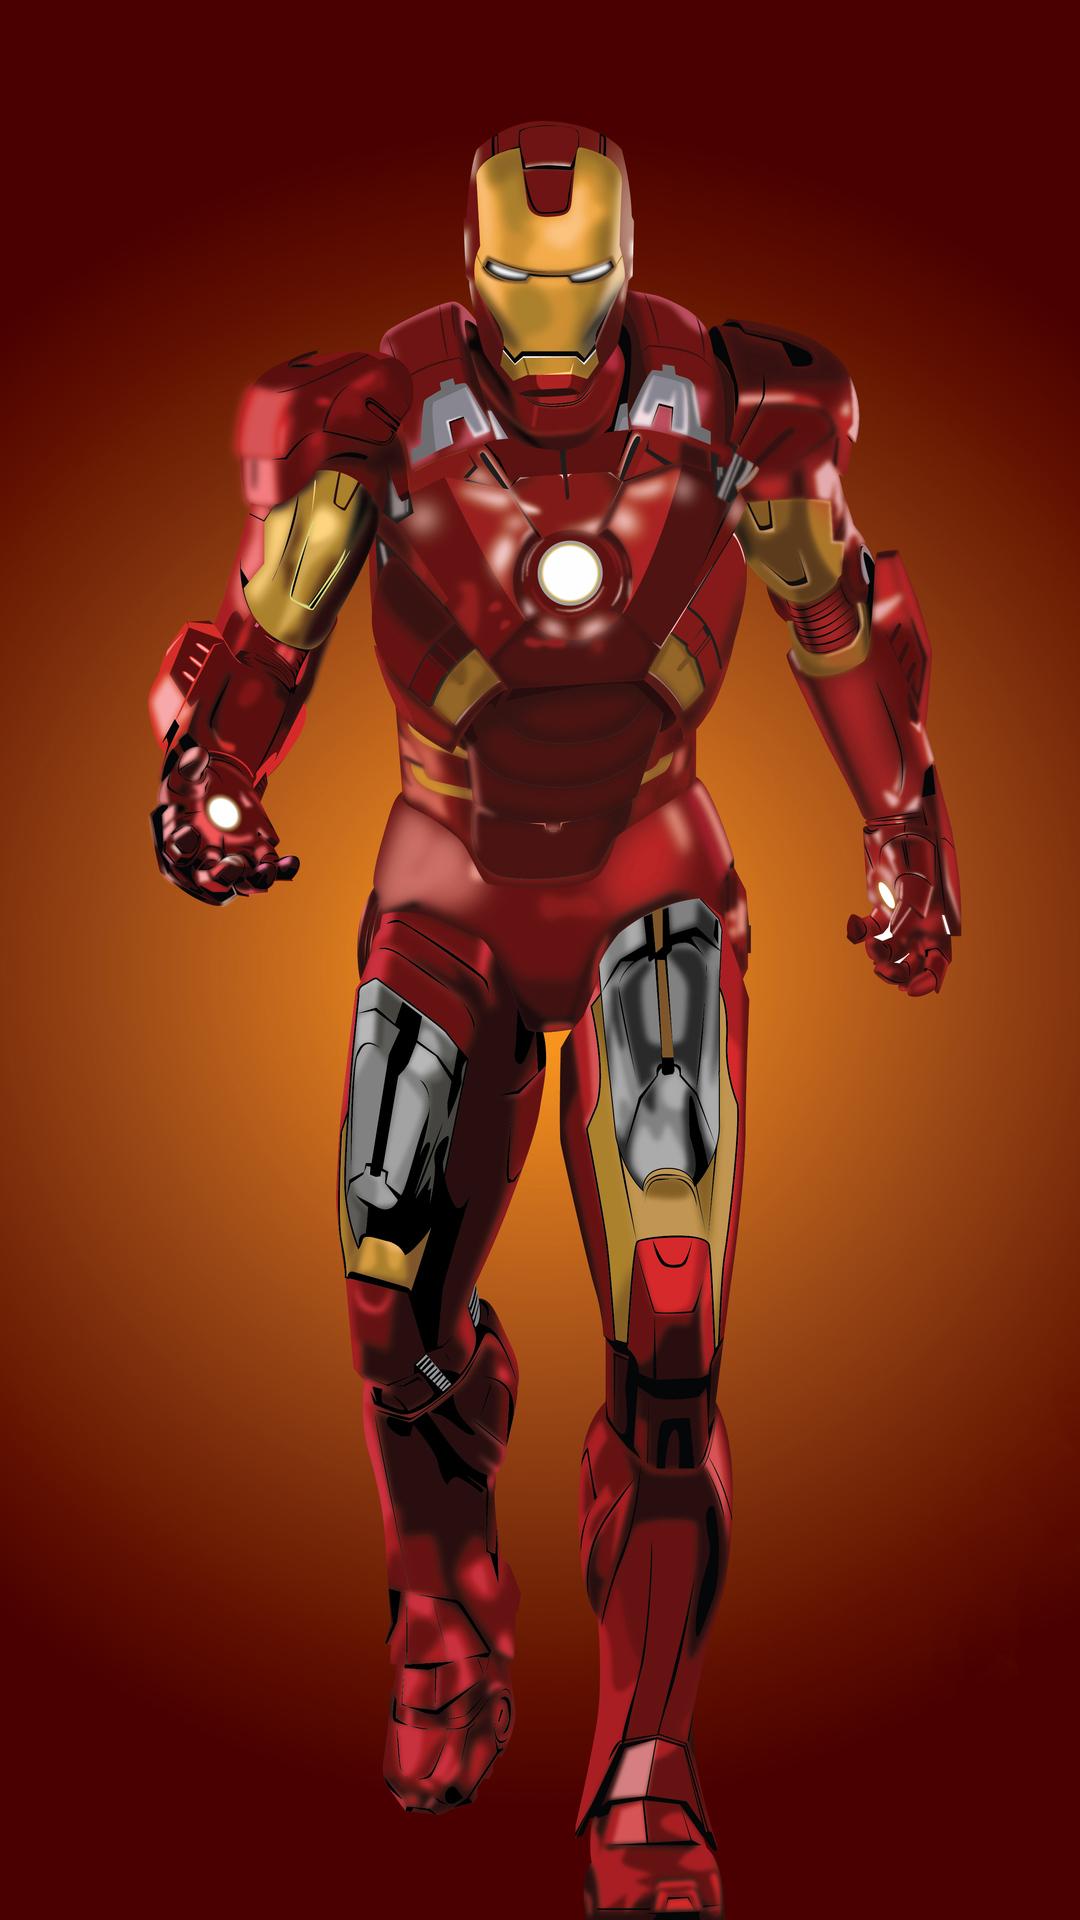 1080x1920 Iron Man Fan Art 4k Iphone 7,6s,6 Plus, Pixel xl